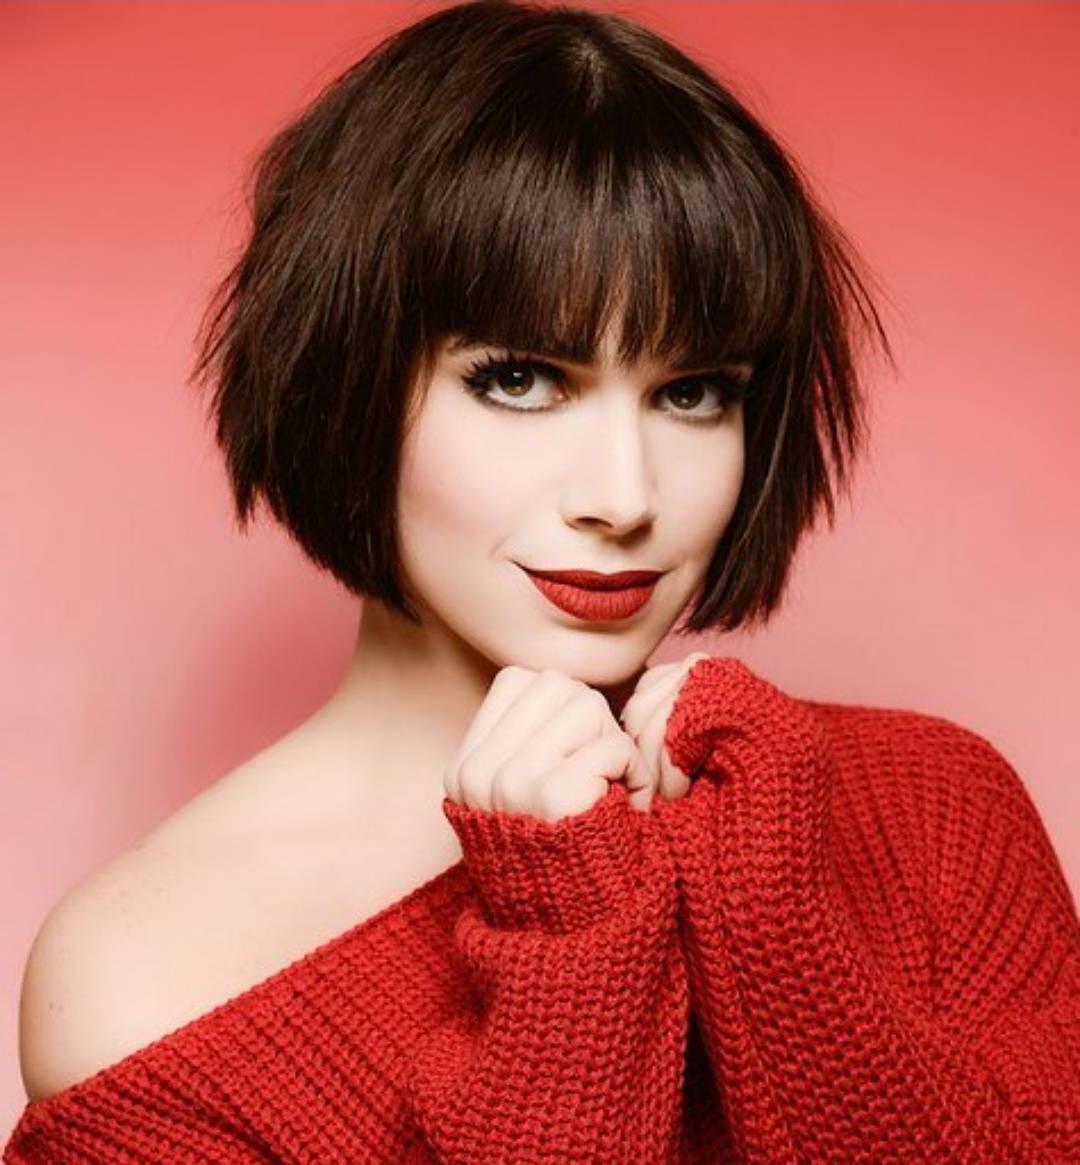 10 Chic Short Bob Haircuts That Balance Your Face Shape! – Short Throughout Chic Short Hair Cuts (View 19 of 25)